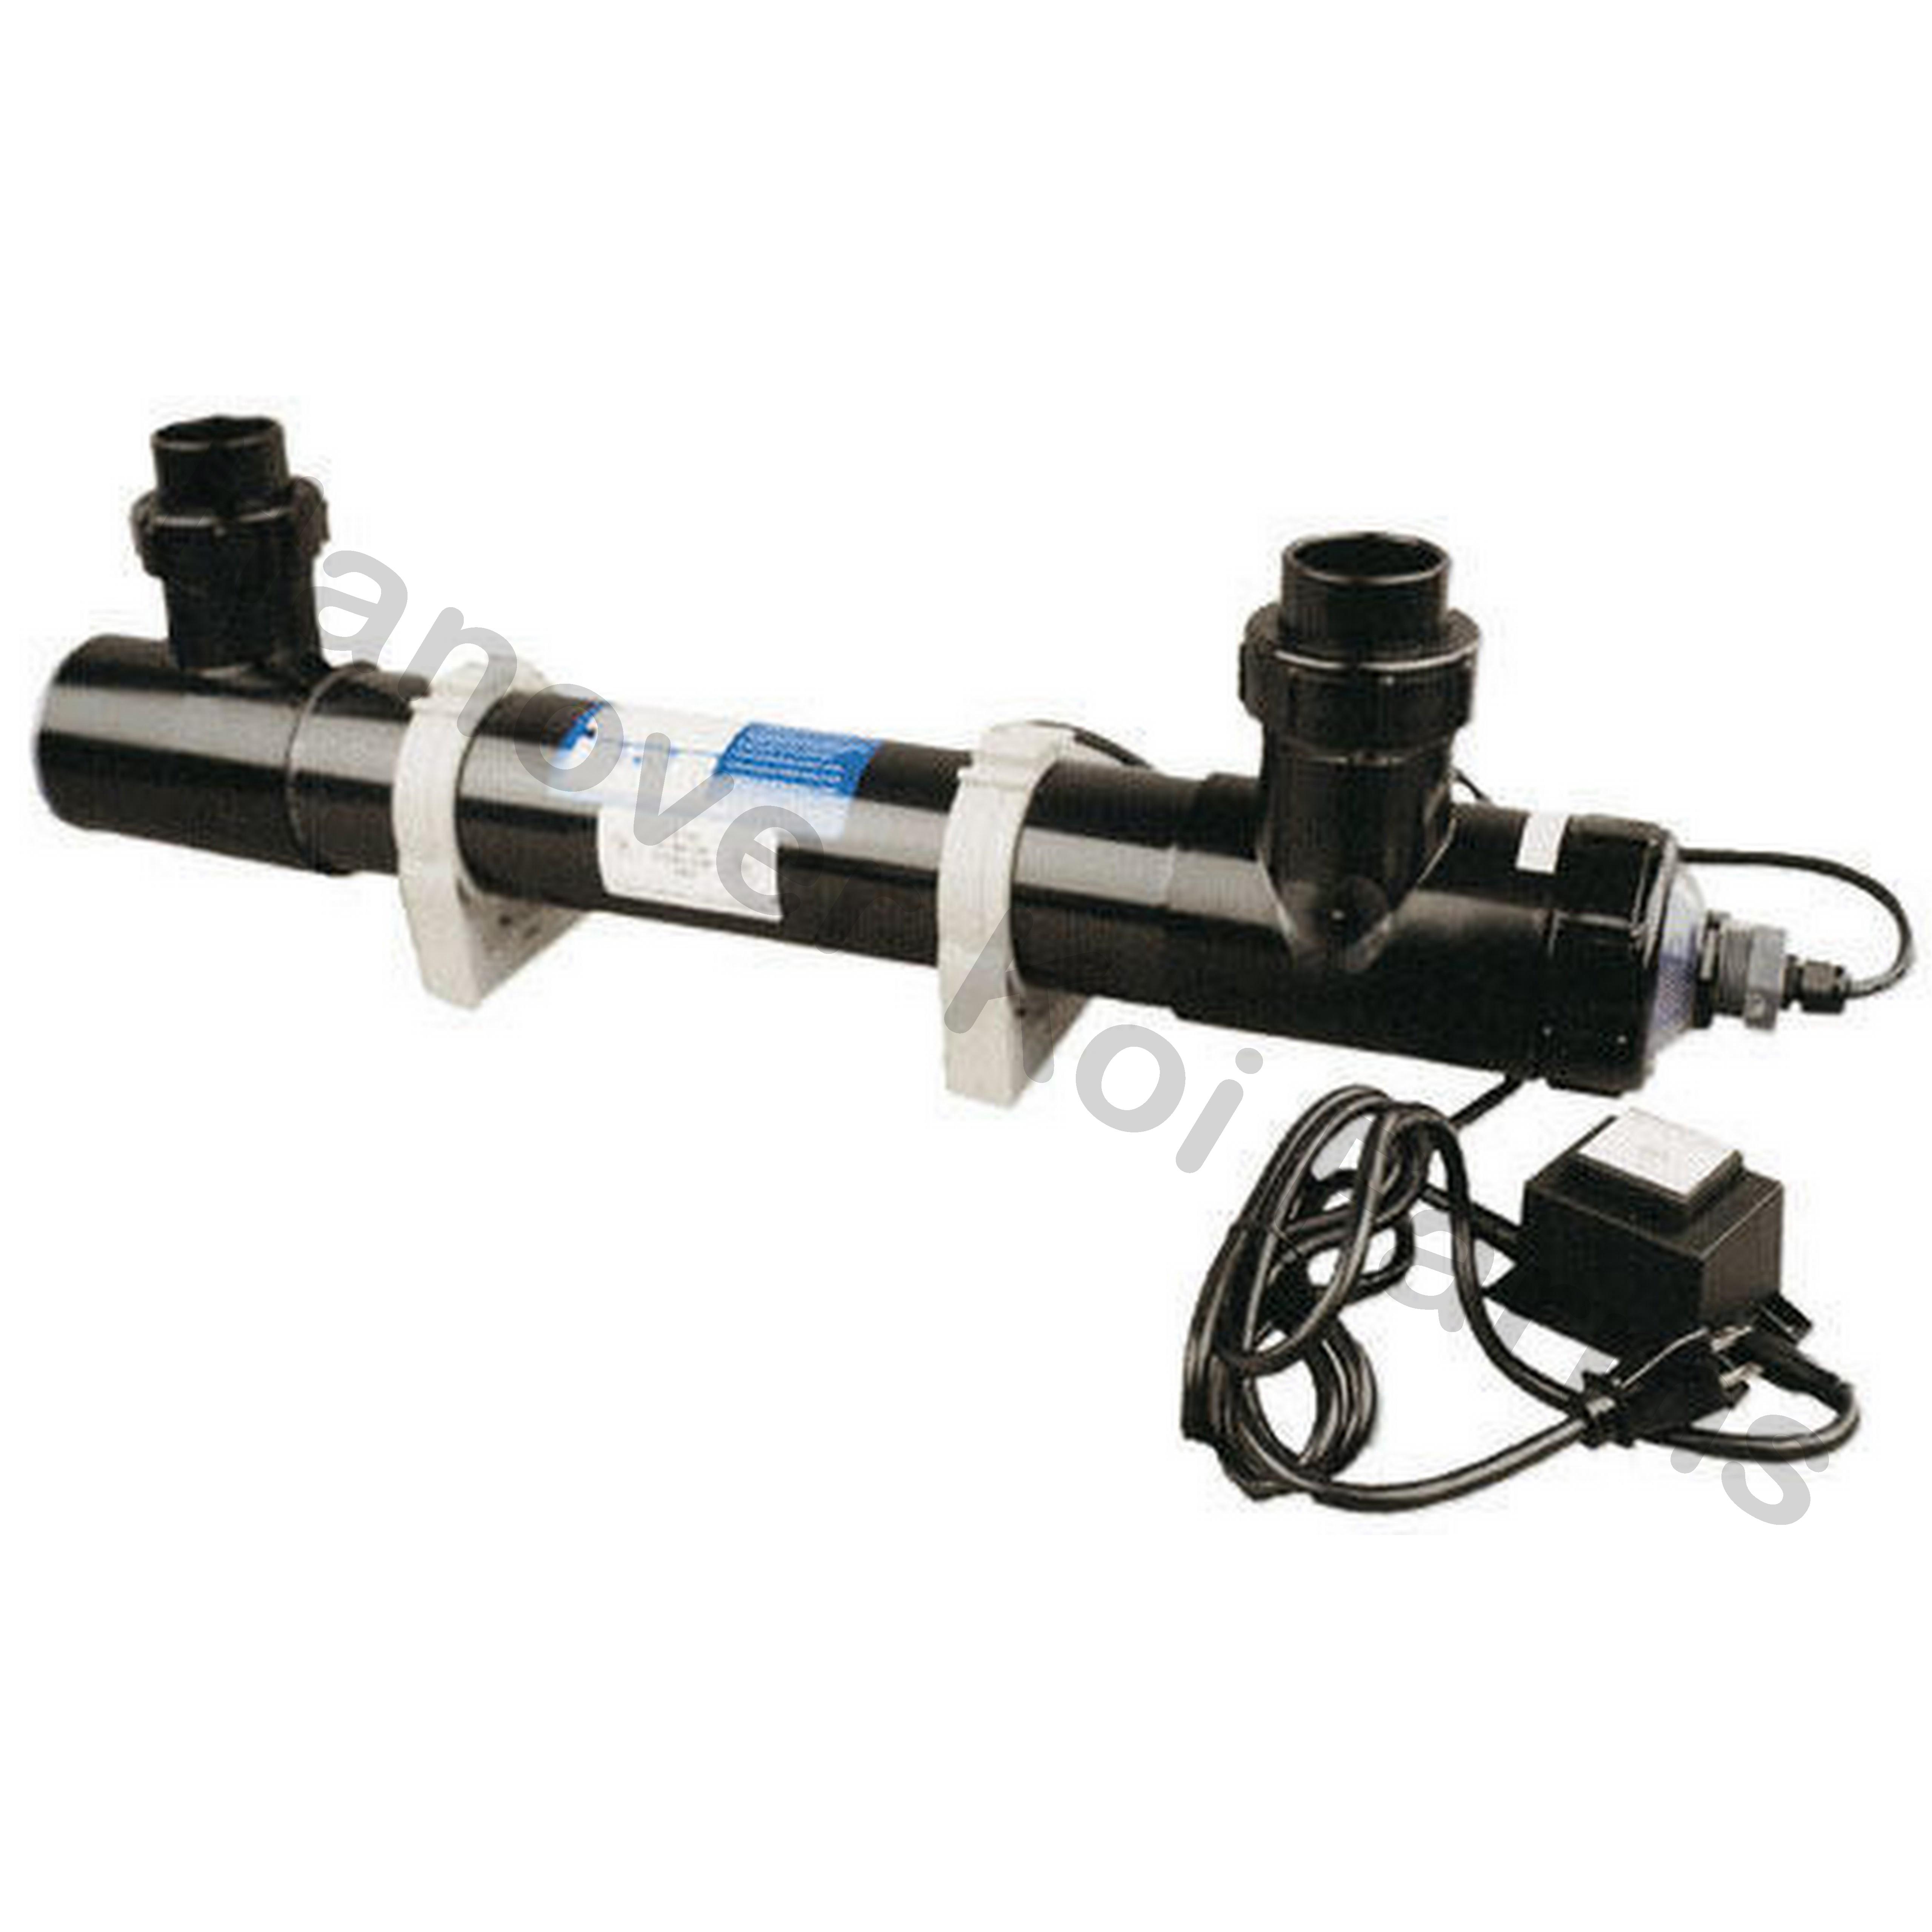 Pond uv light 25 watt emperor sterilizer series eu25 u for Uv light koi fish pond